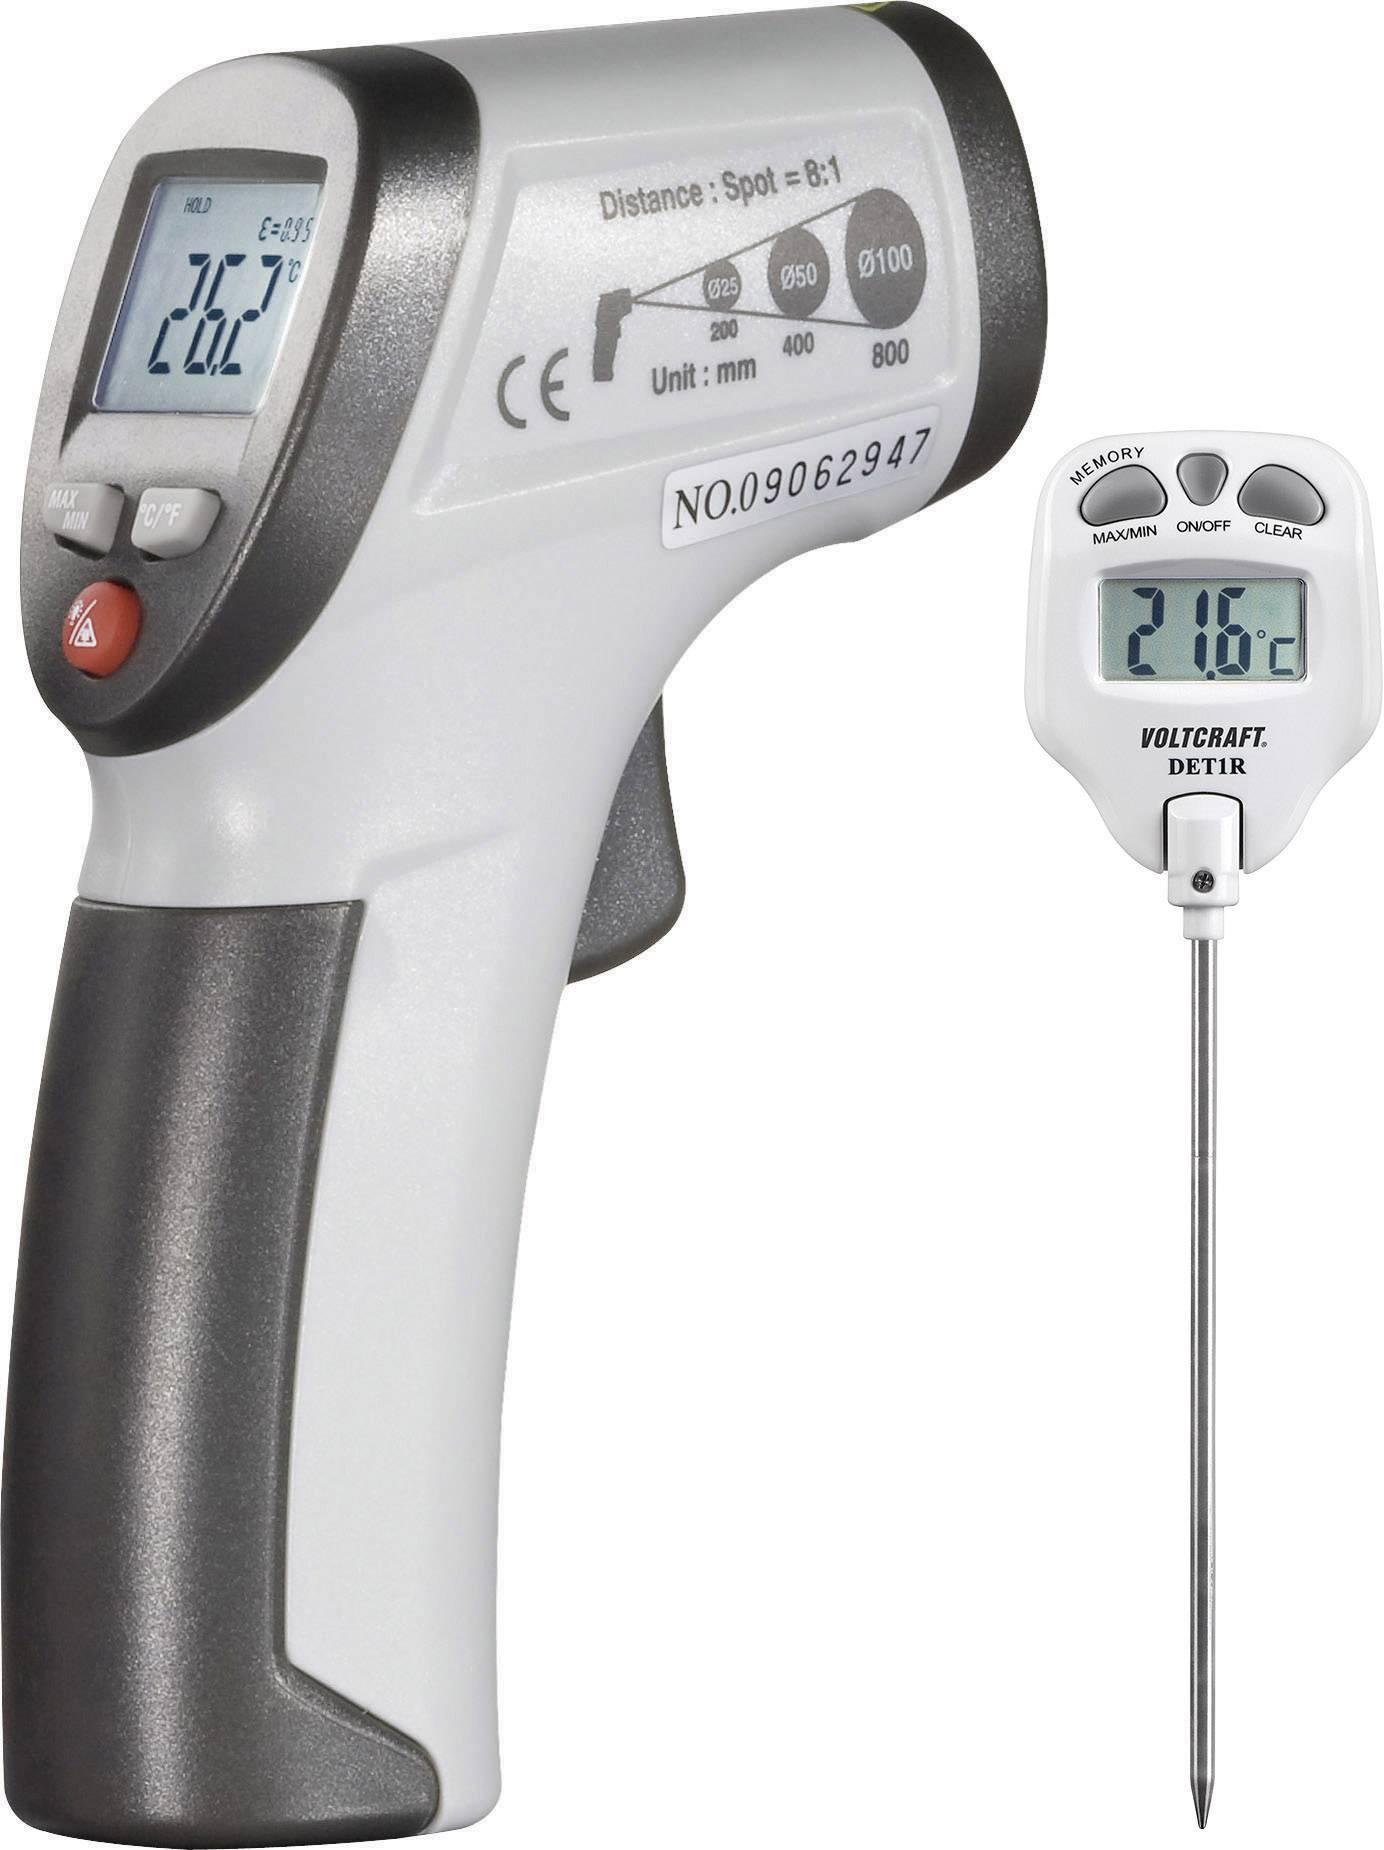 Infračervený teplomer VOLTCRAFT IR 260-8S + DET1R, Optika 8:1, -30 do +260 °C, kontaktné meranie